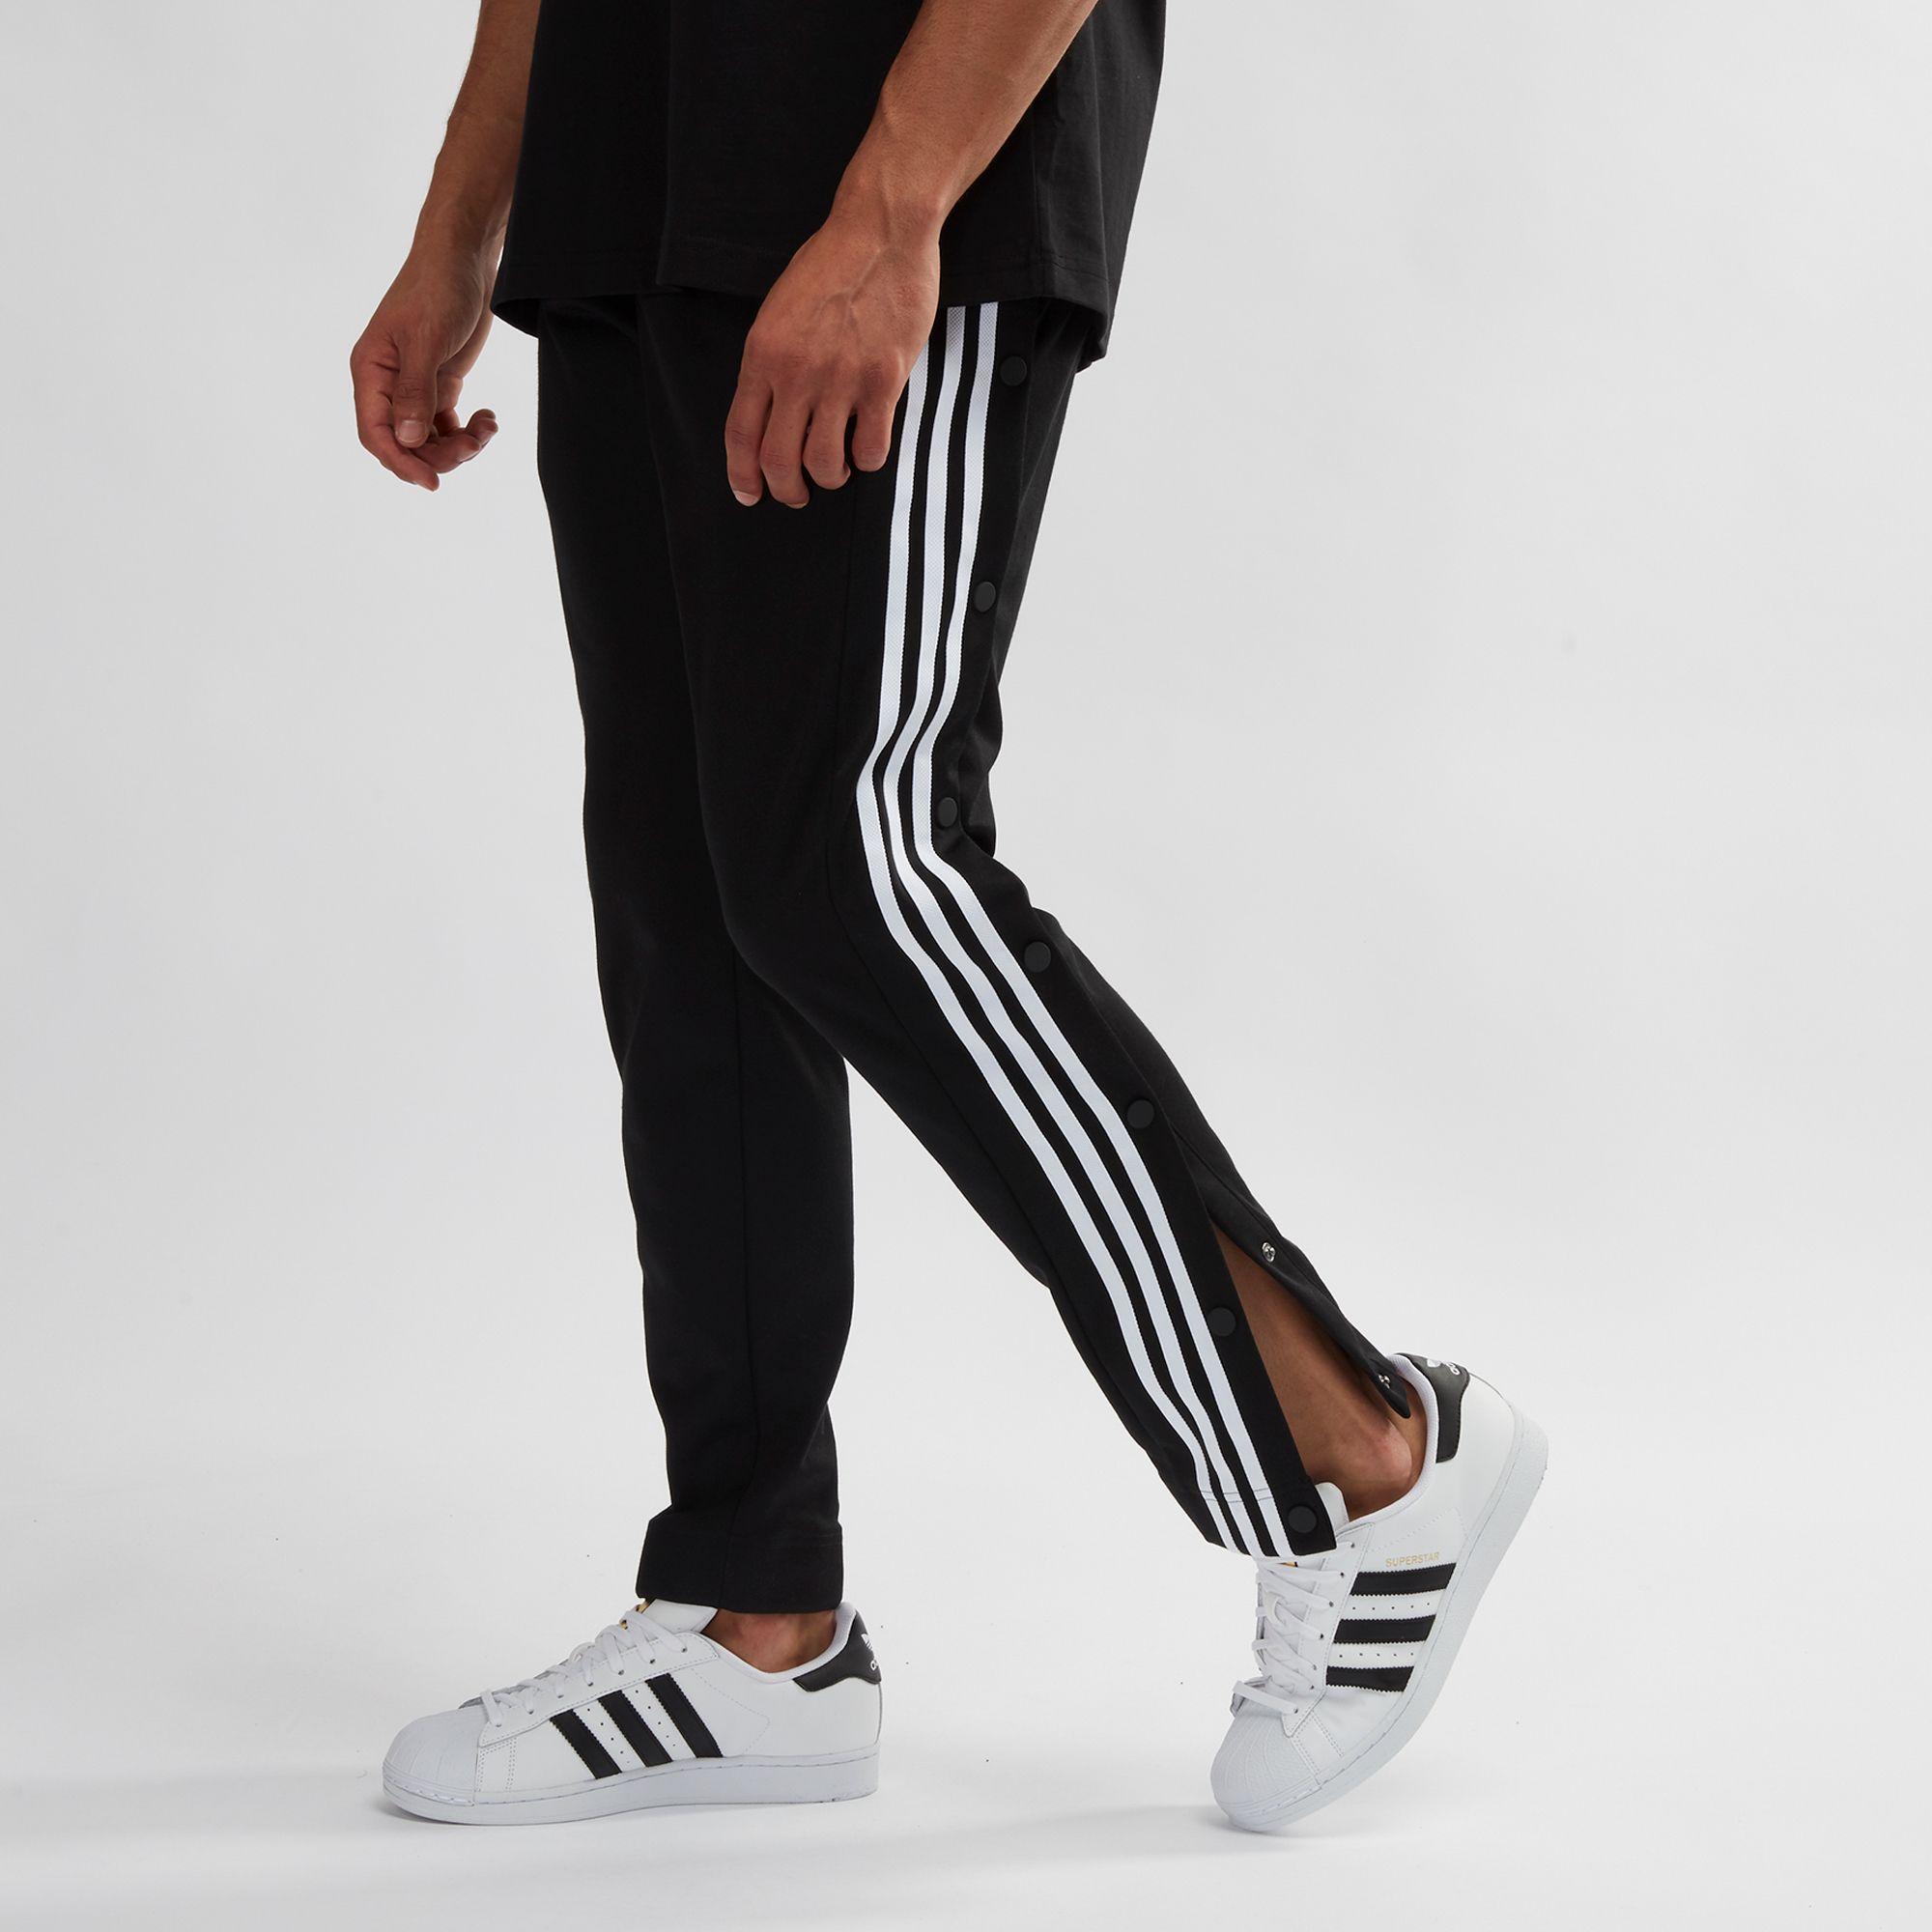 Compra Adidas Originals Adicolor negro adibreak Snap pantalones negro